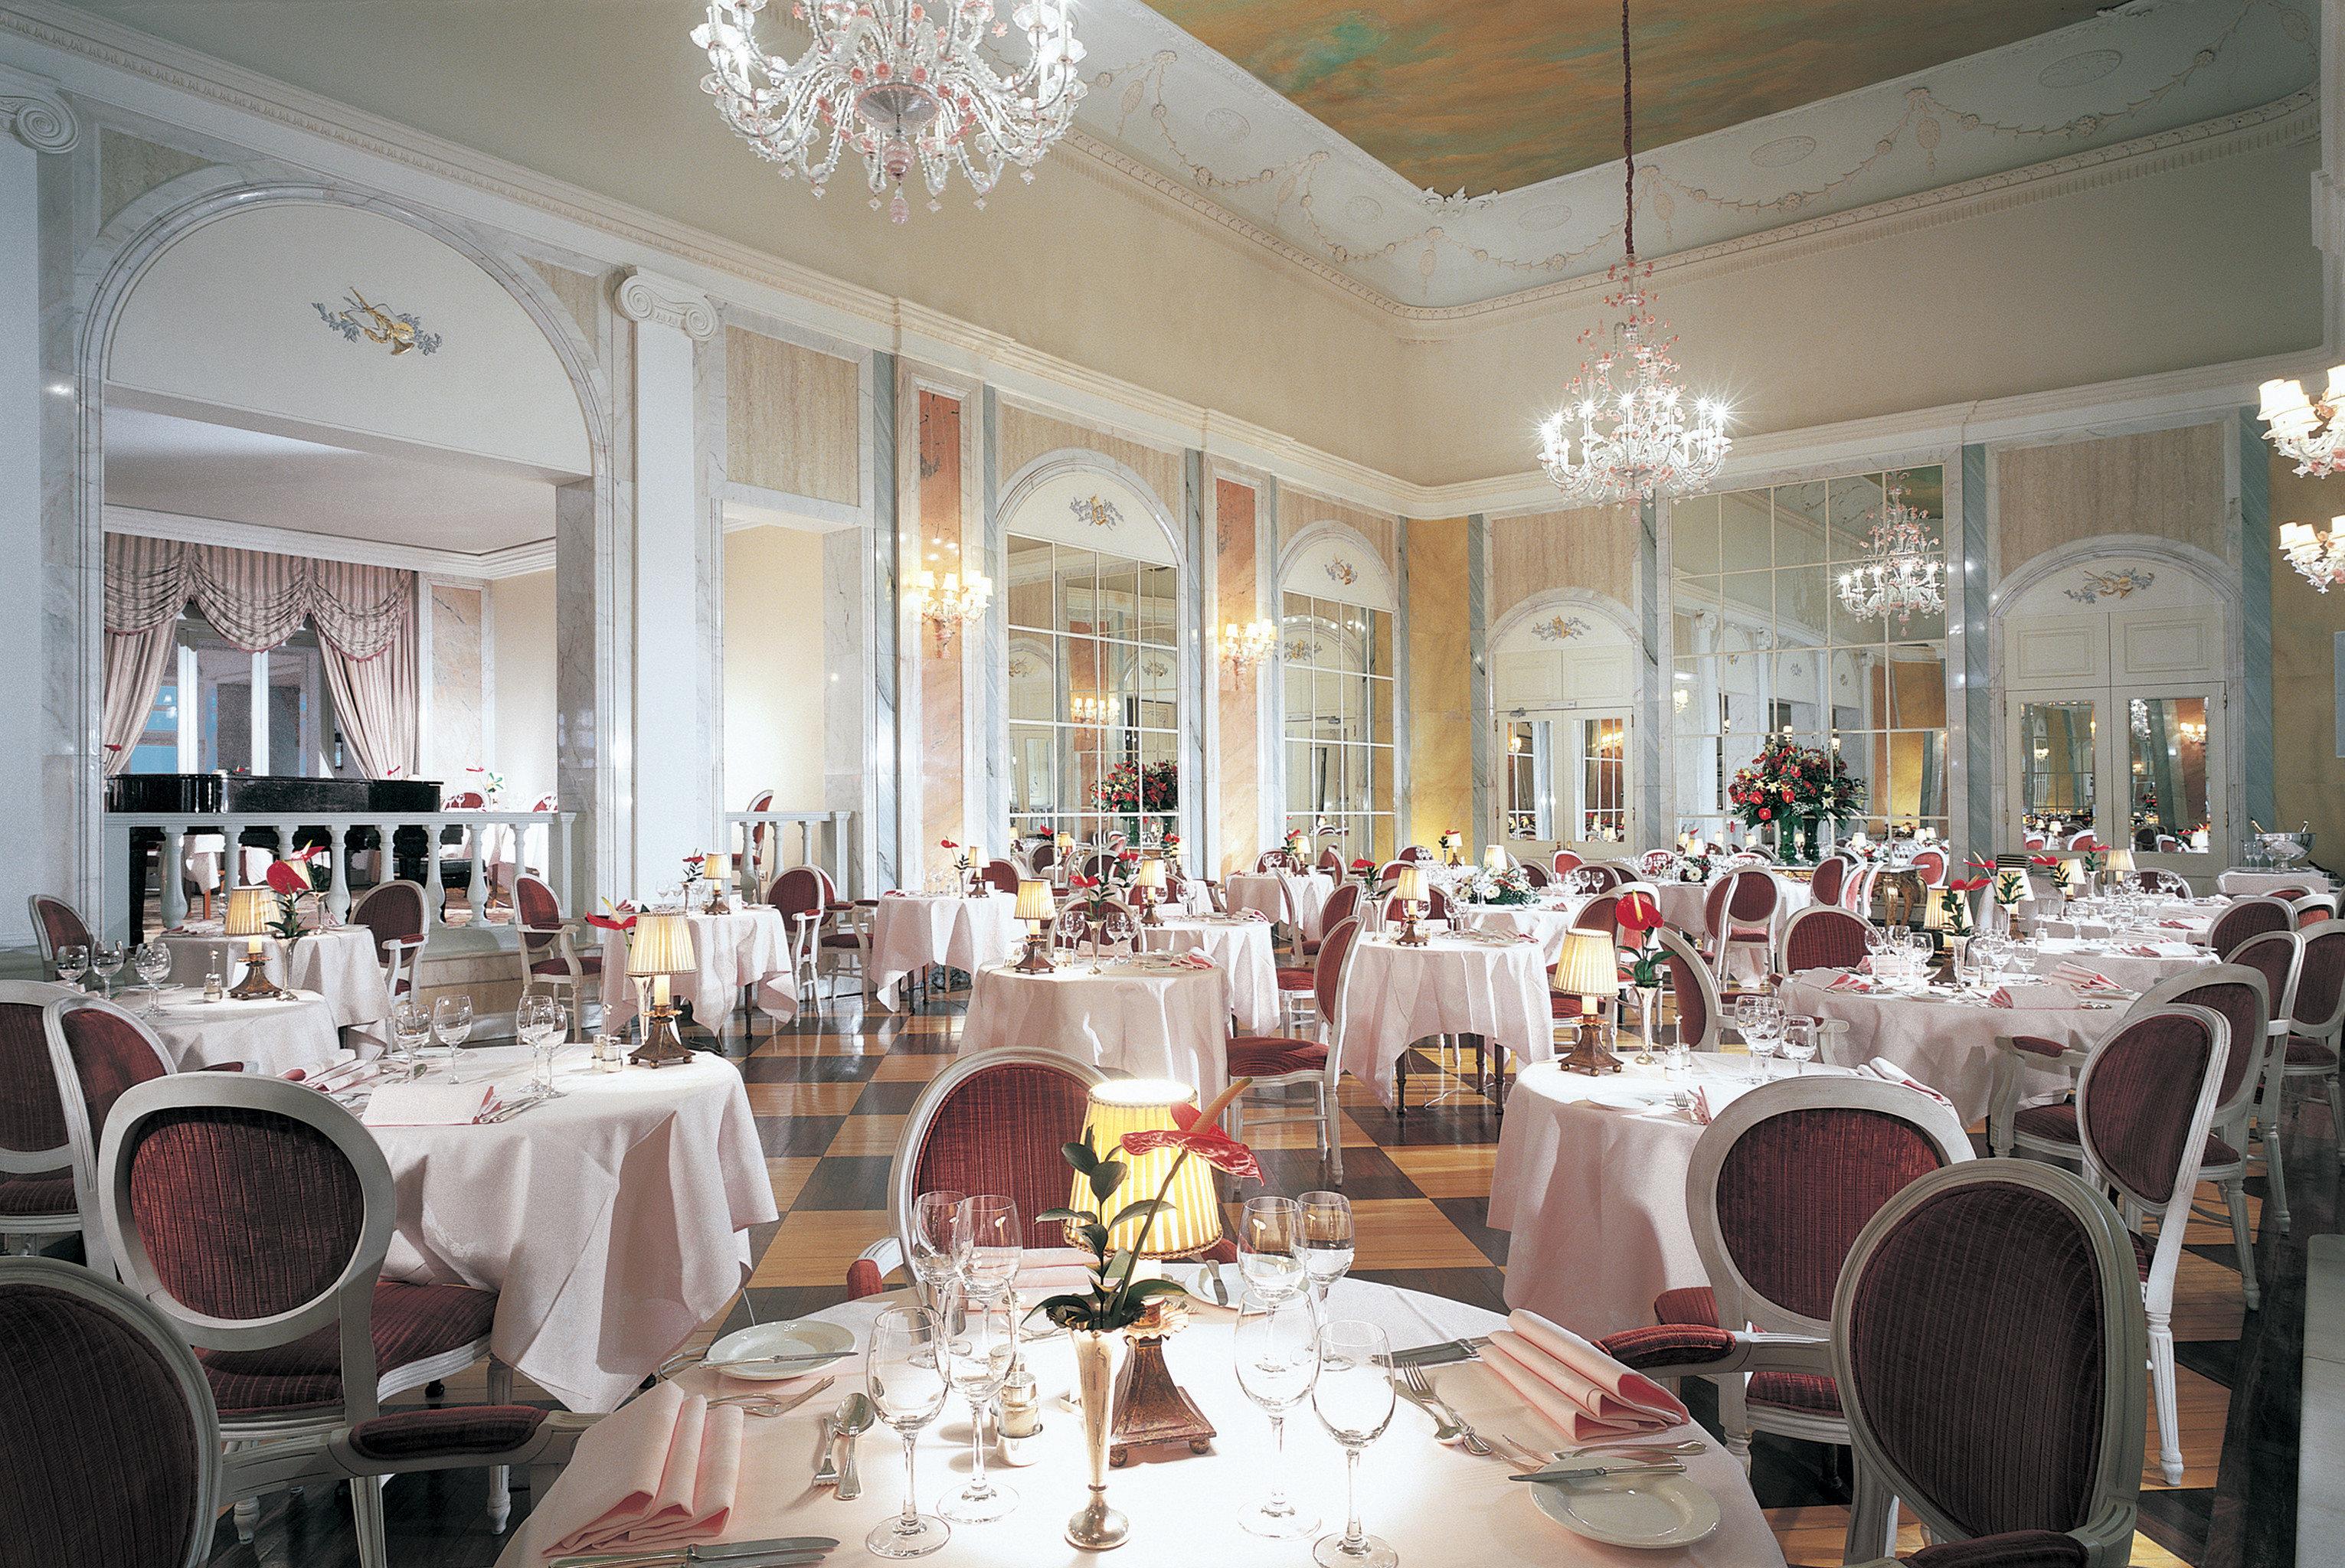 Dining Drink Eat Elegant Luxury chair function hall wedding ceremony restaurant wedding reception ballroom banquet set dining table